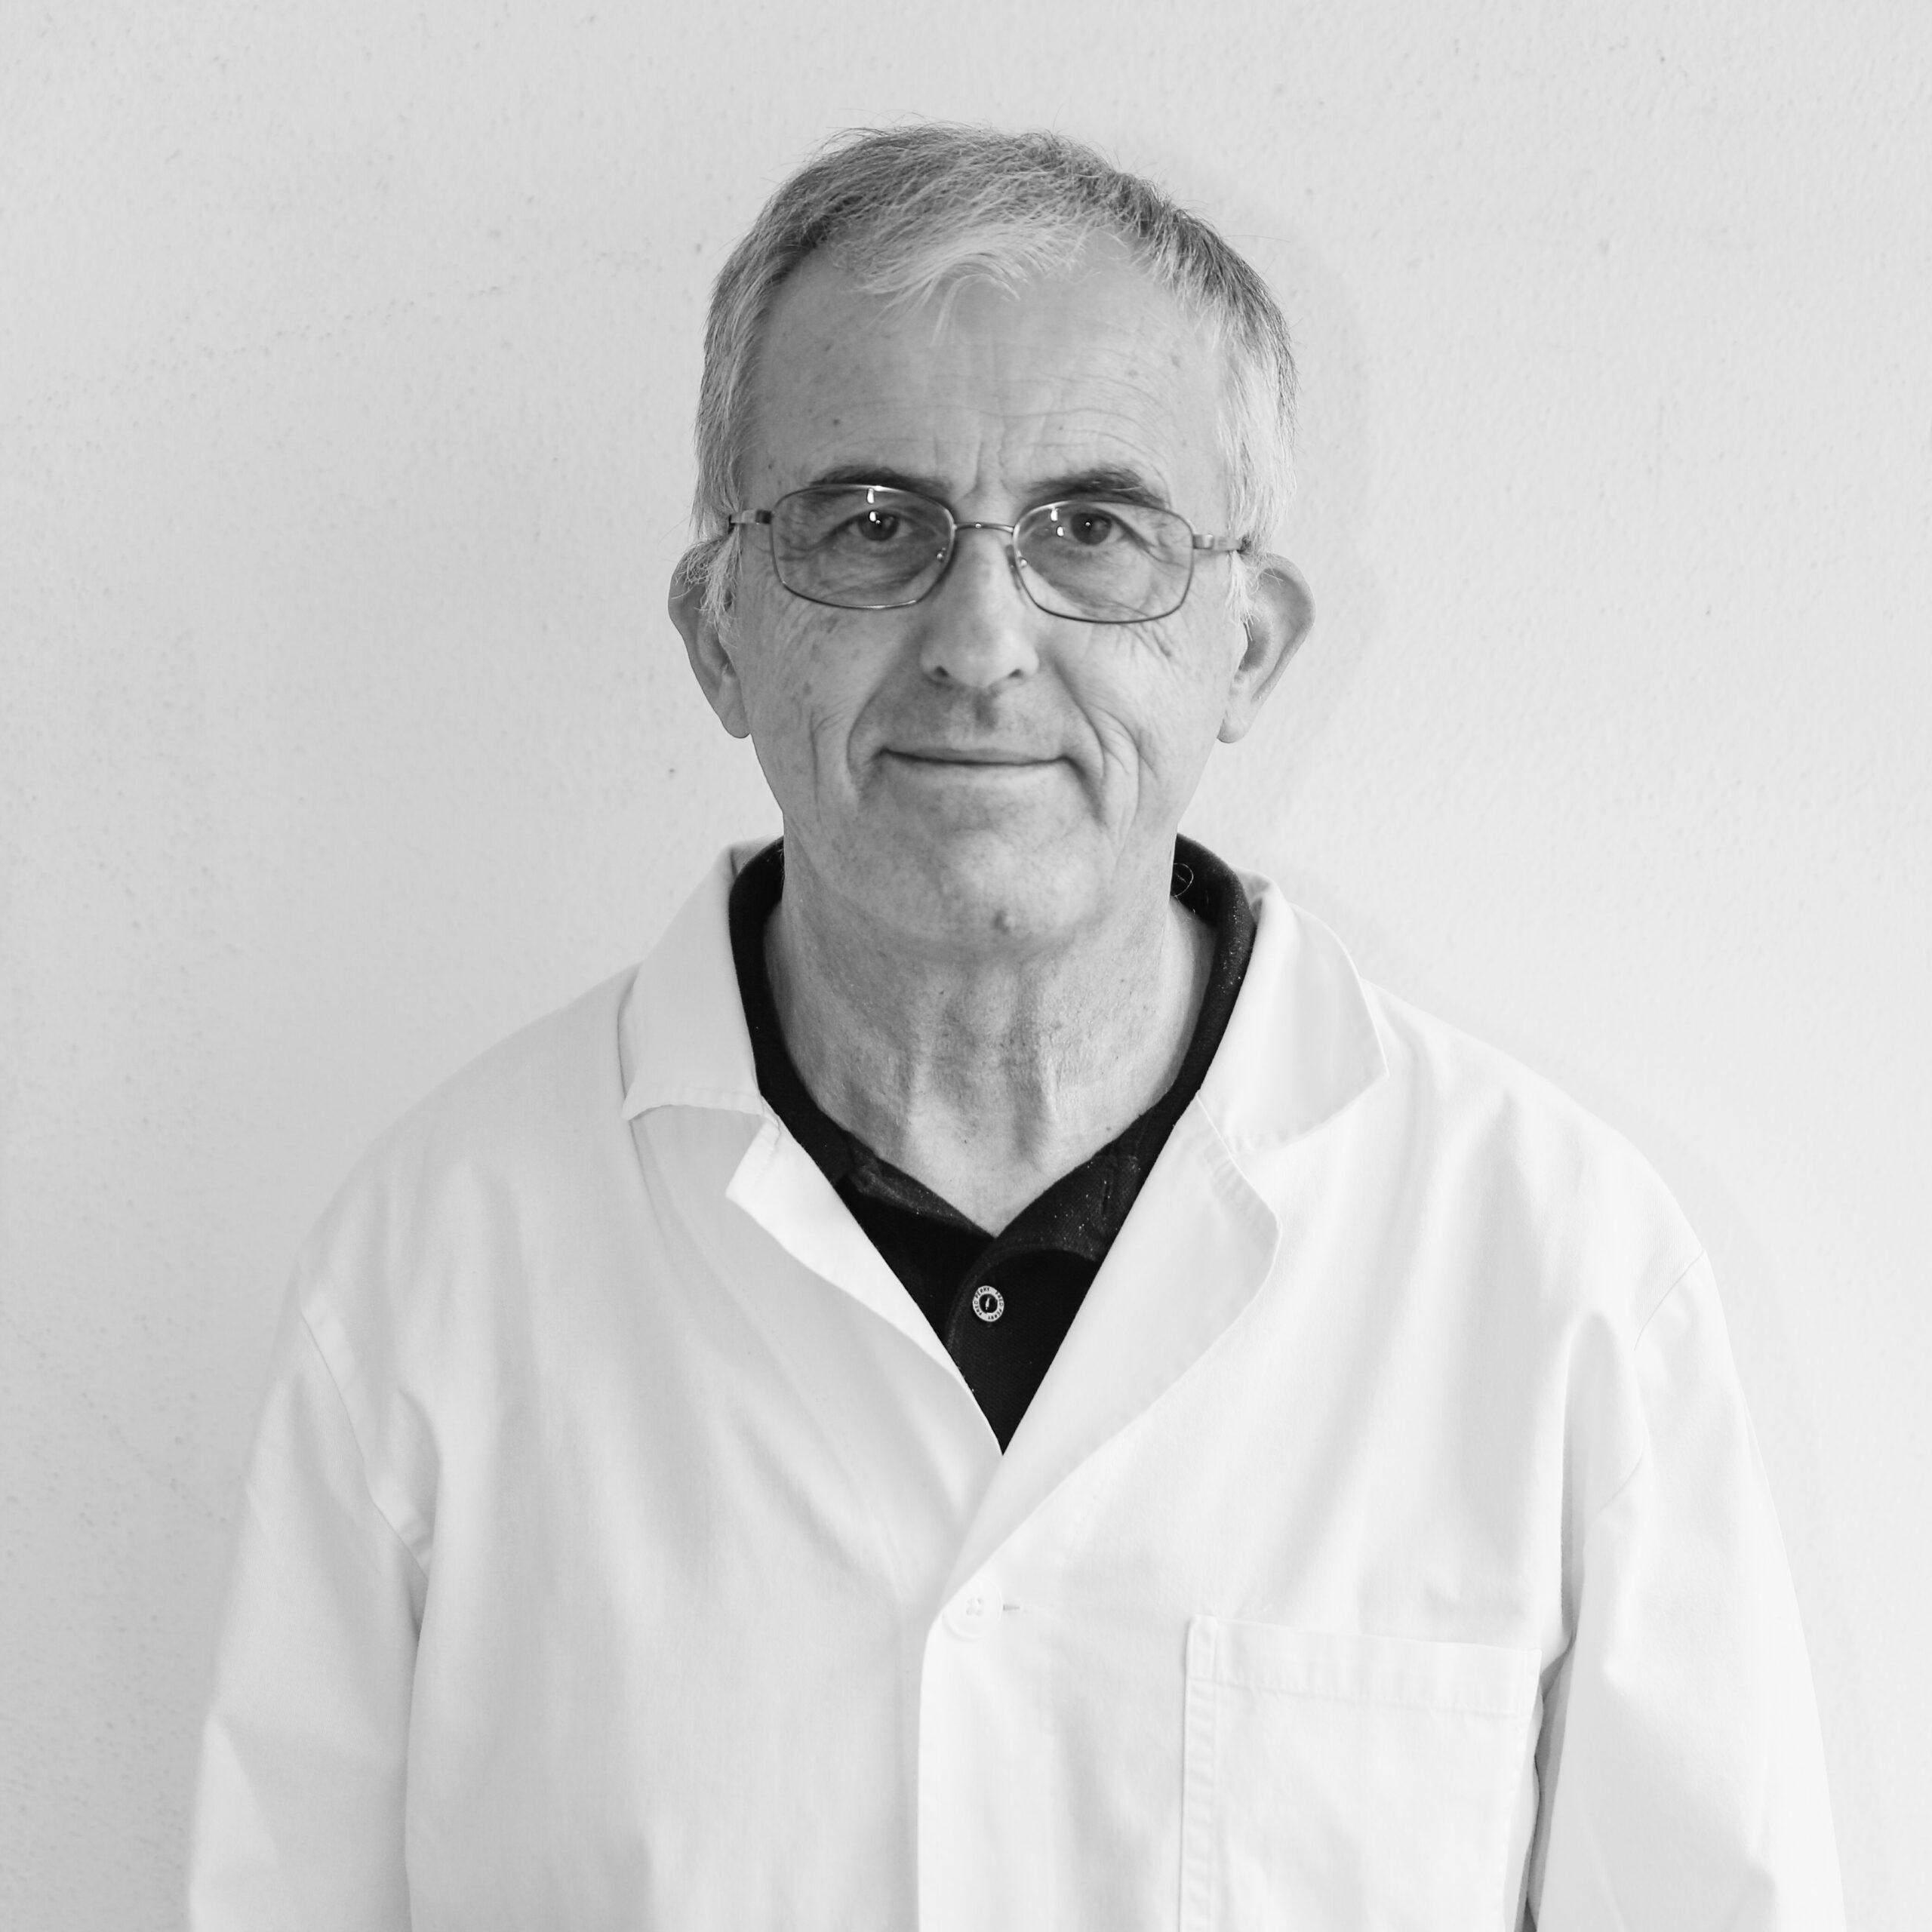 Dr. F. Gassino